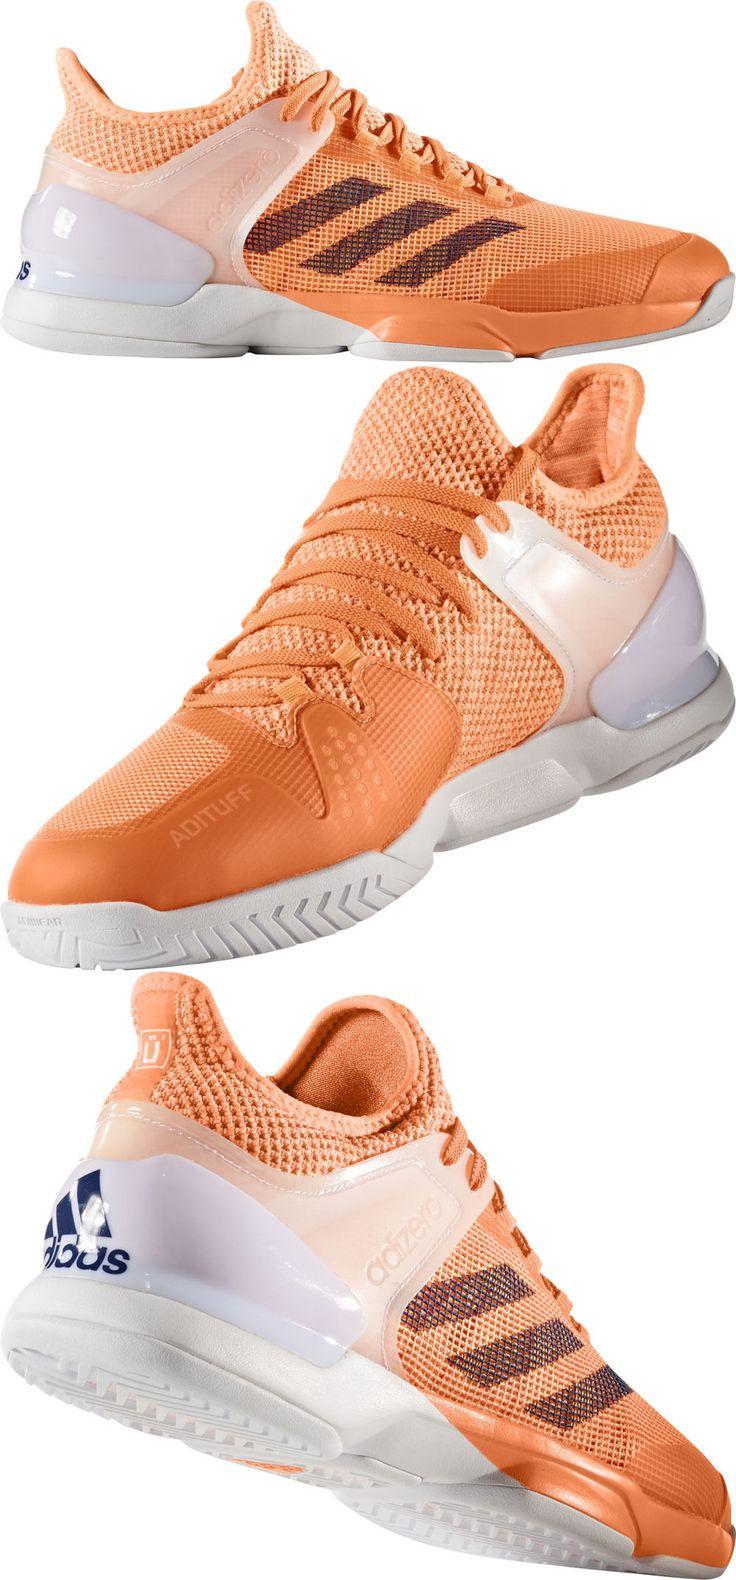 Shoes 62230: Adidas Adizero Ubersonic 2 Orange/White Mens Shoe -> BUY IT NOW ONLY: $89.95 on eBay!